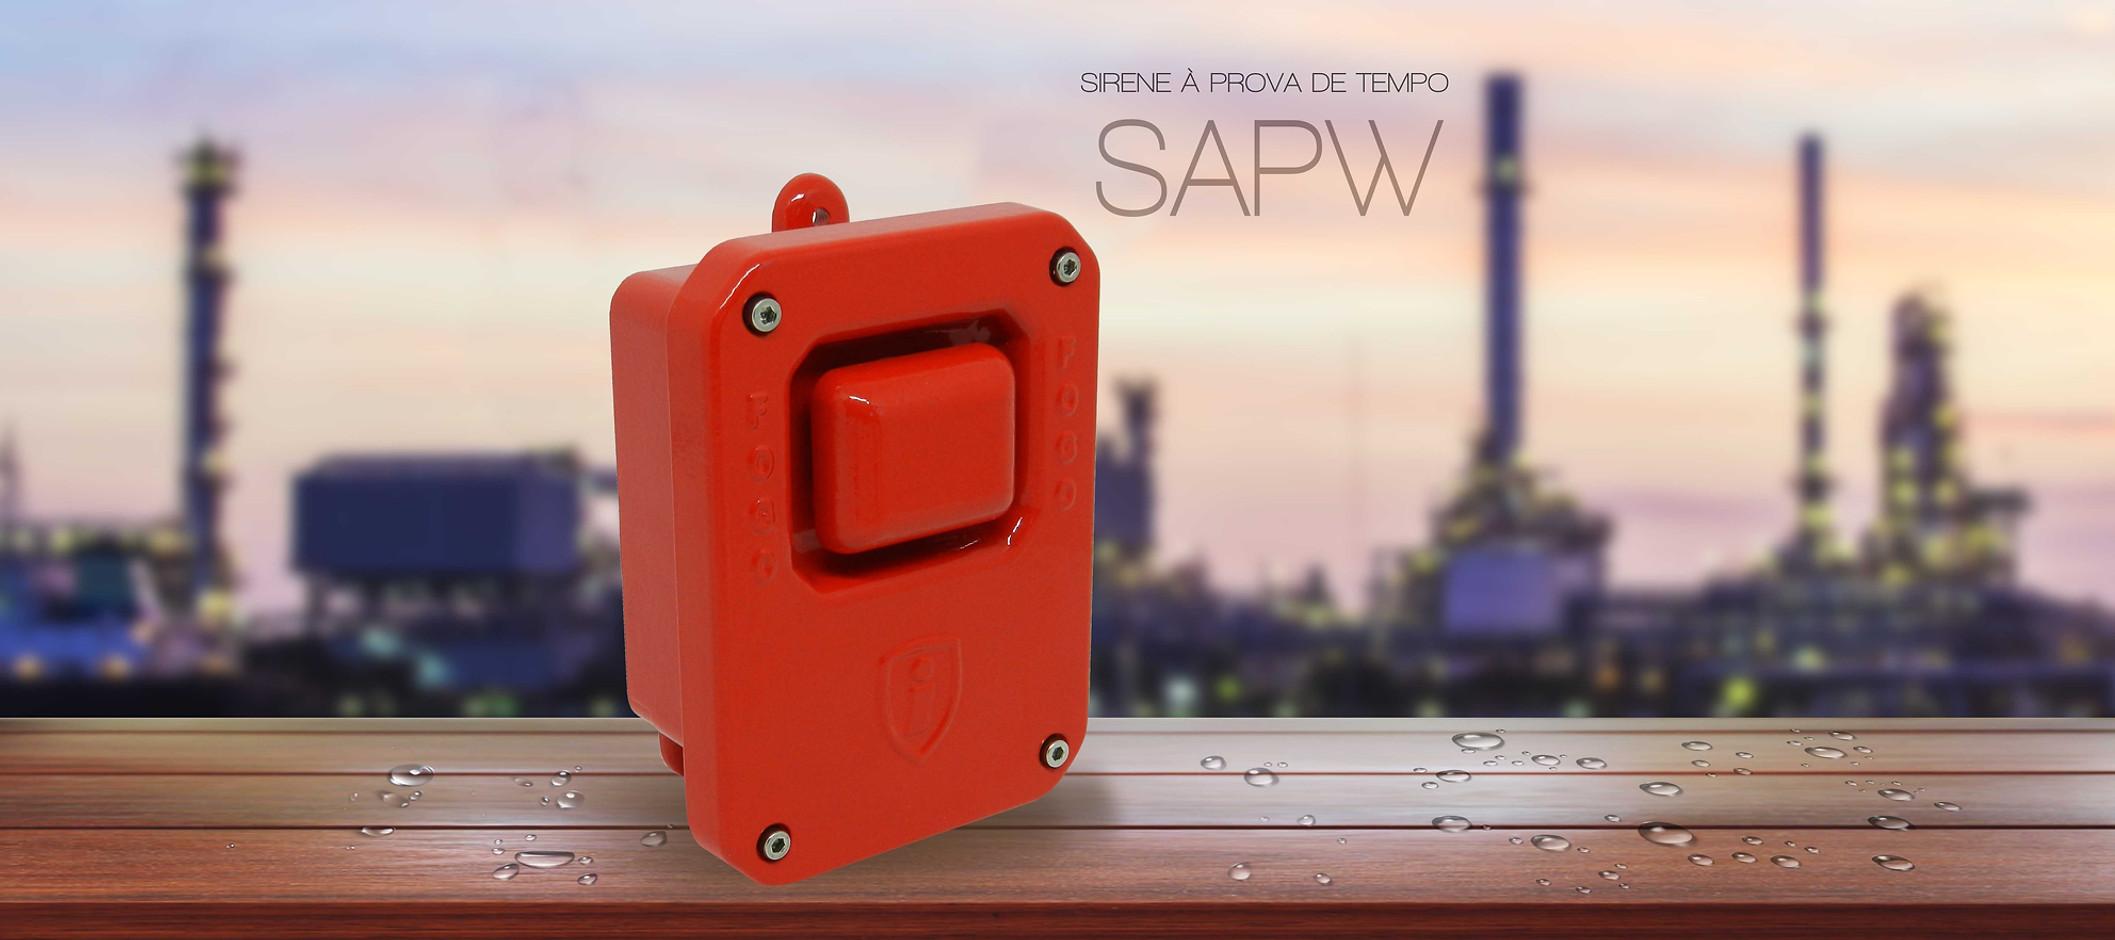 banner sapw.jpg